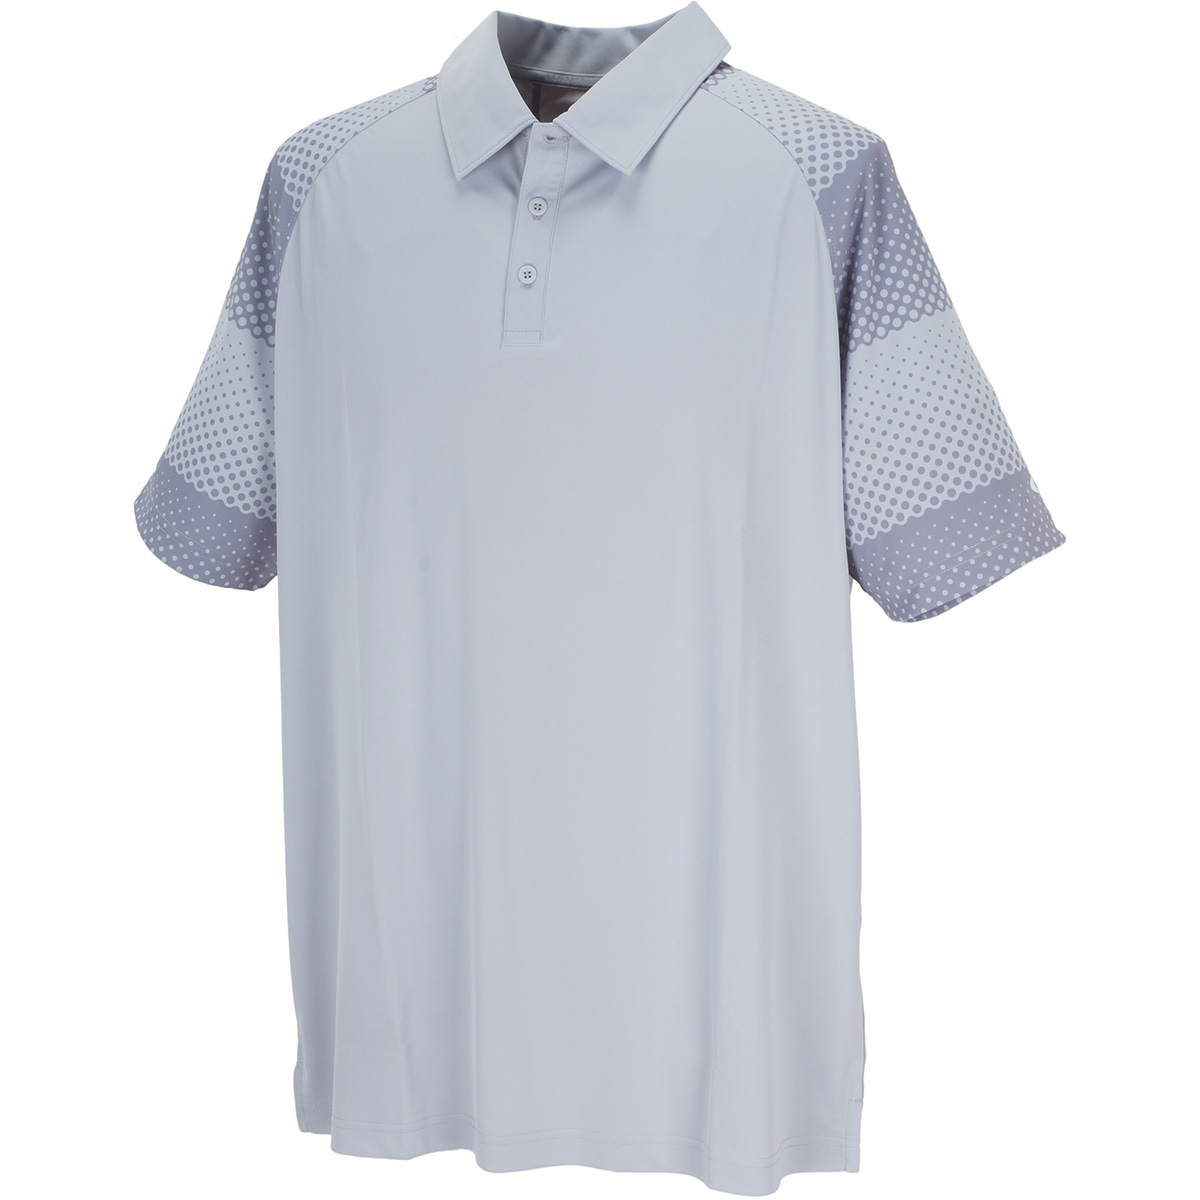 DOT 半袖ポロシャツ